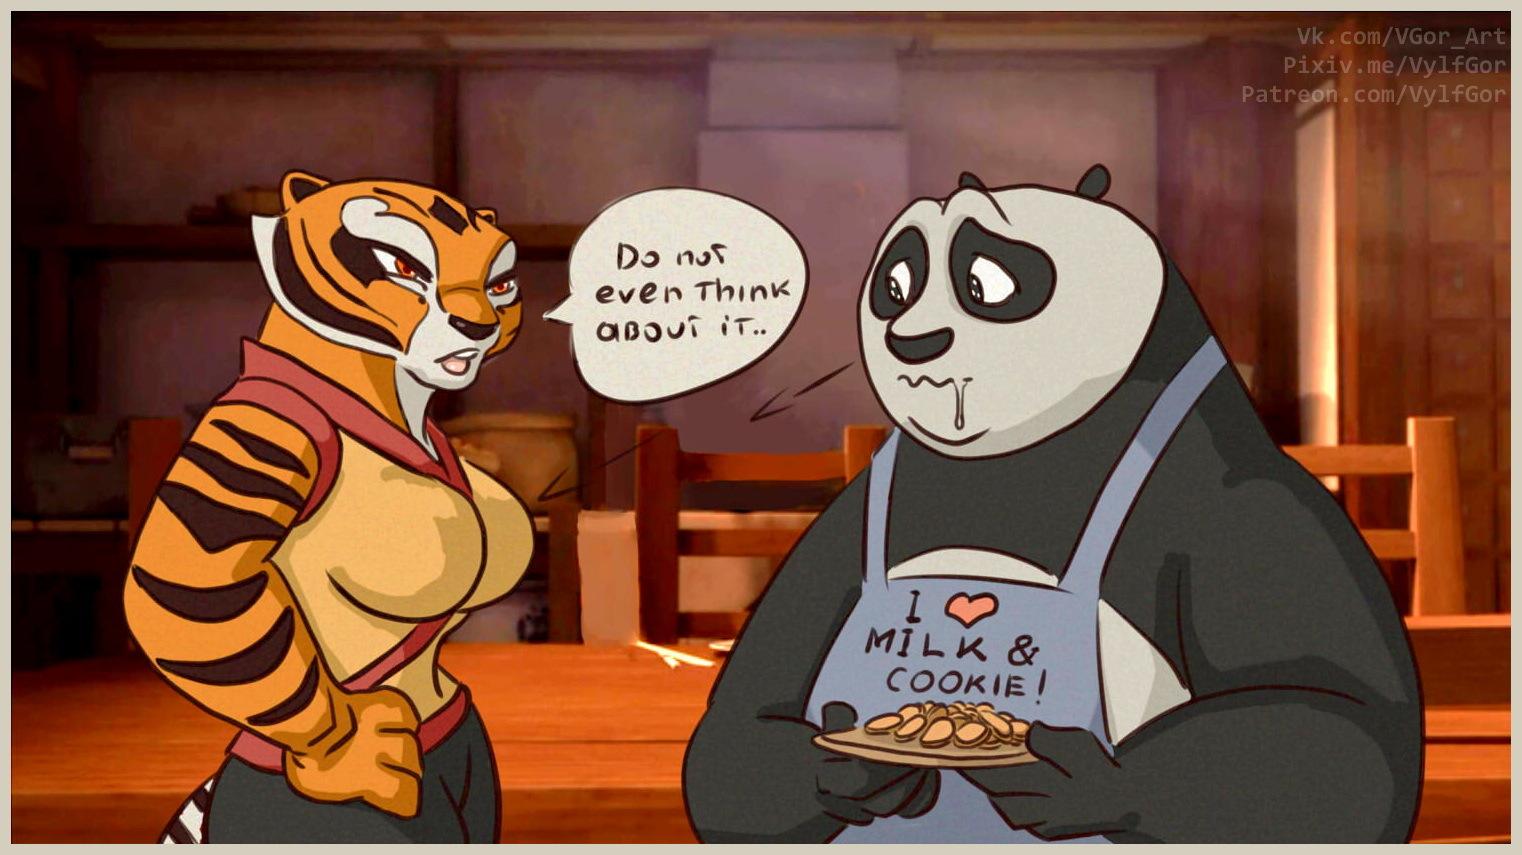 Po and TigressProposal by 11Po-Tigress-Love11